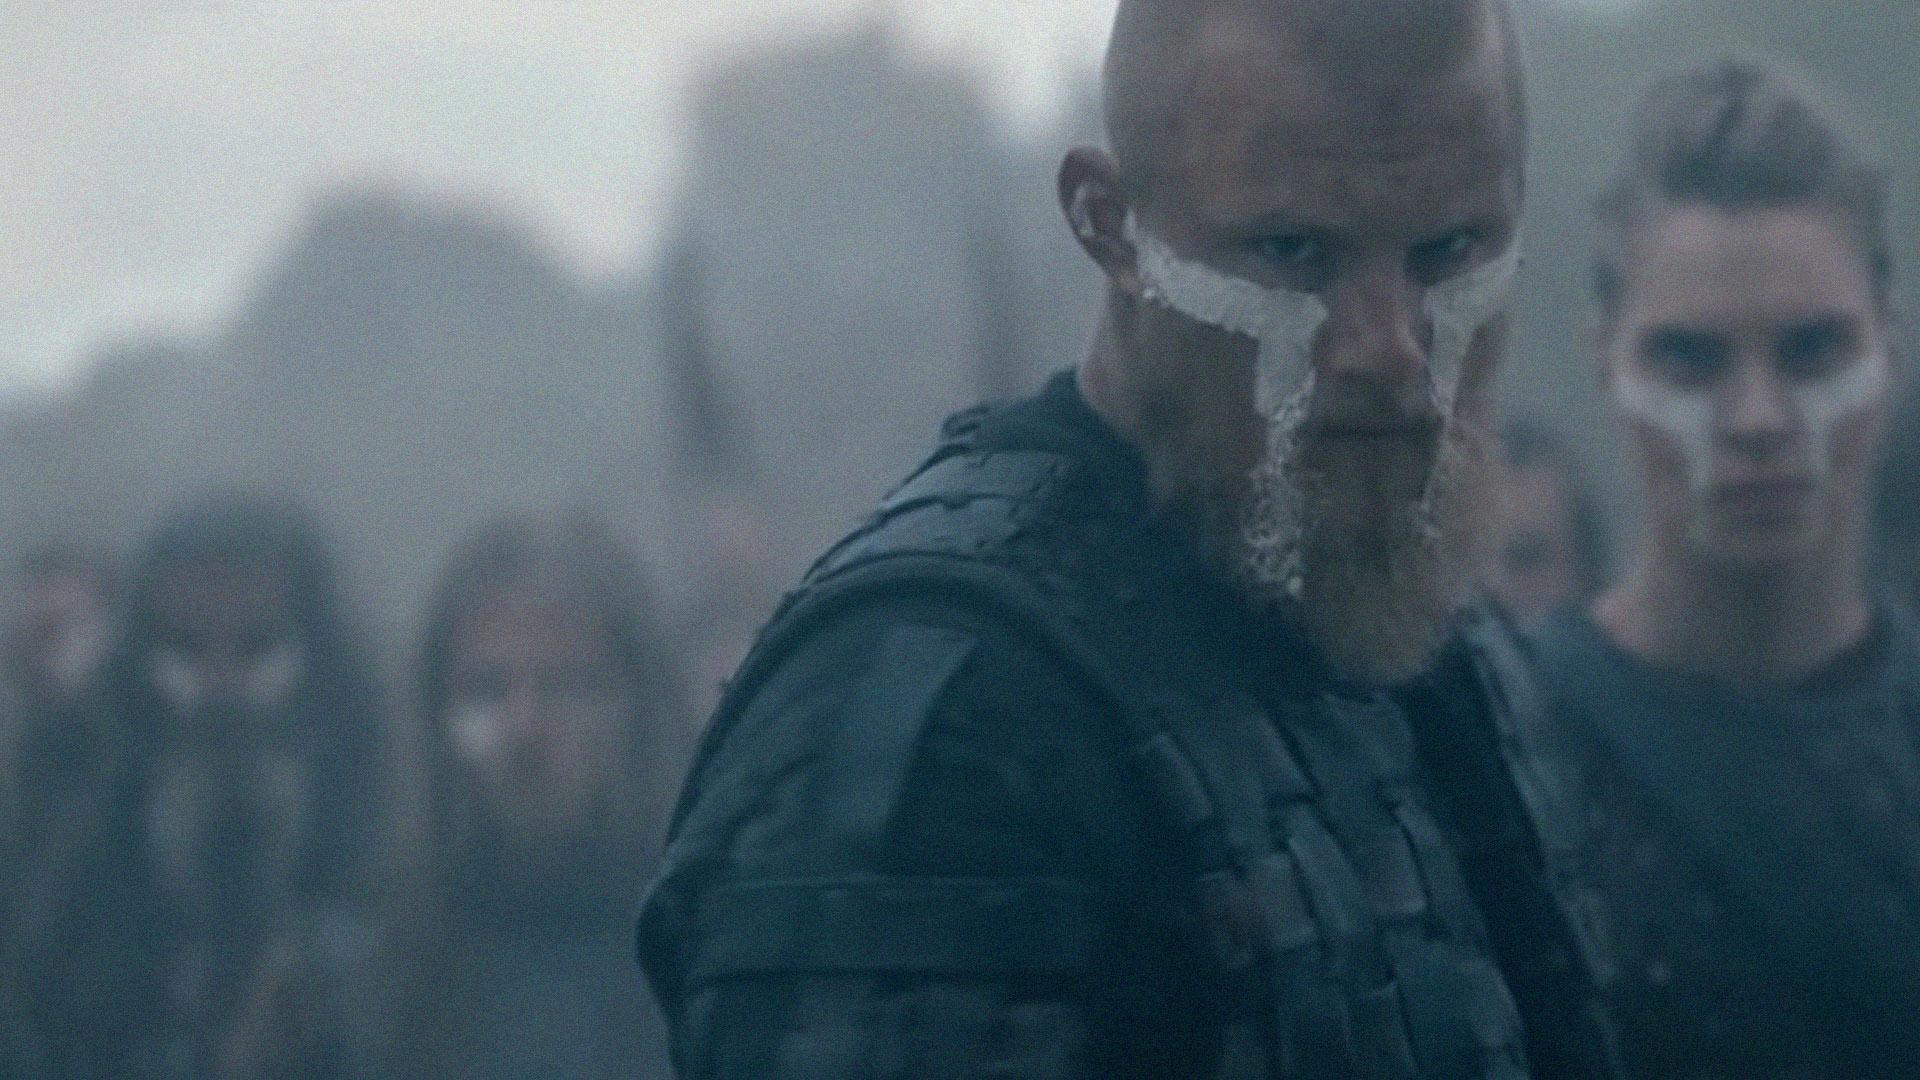 Watch Vikings Season 5 Part 2 Prime Video